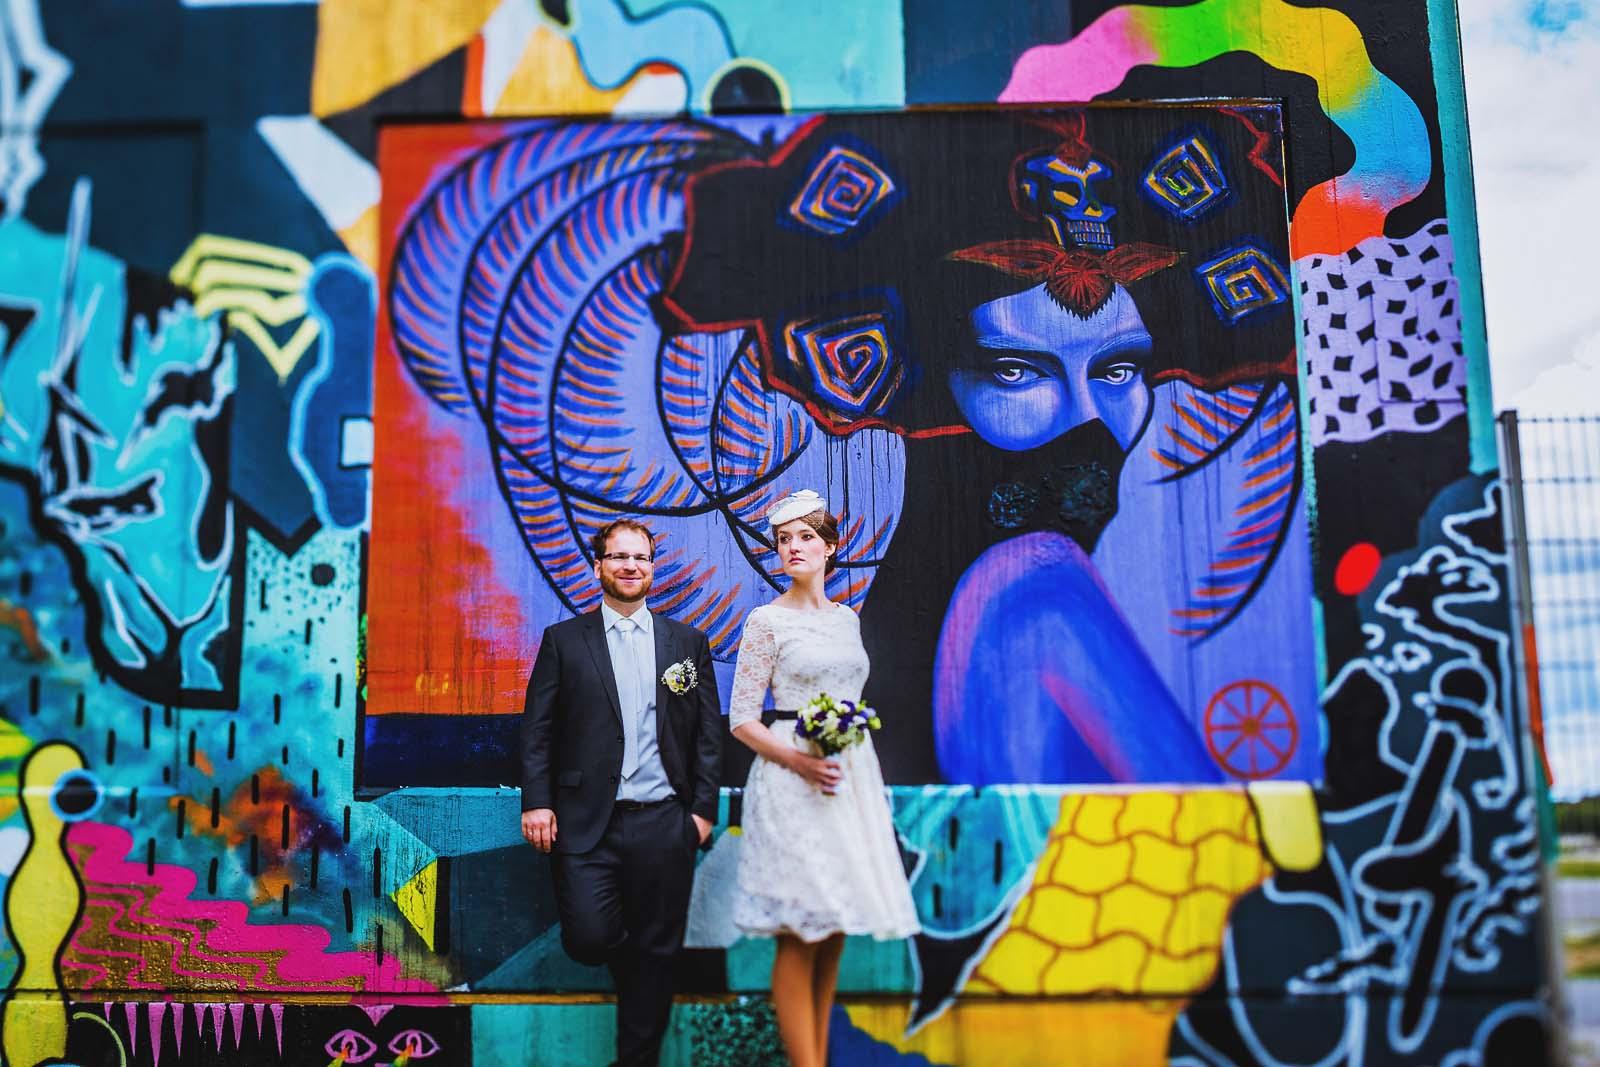 Hochzeitsfotograf Berlin Copyright by Hochzeitsfotograf www.berliner-hochzeitsfotografie.de